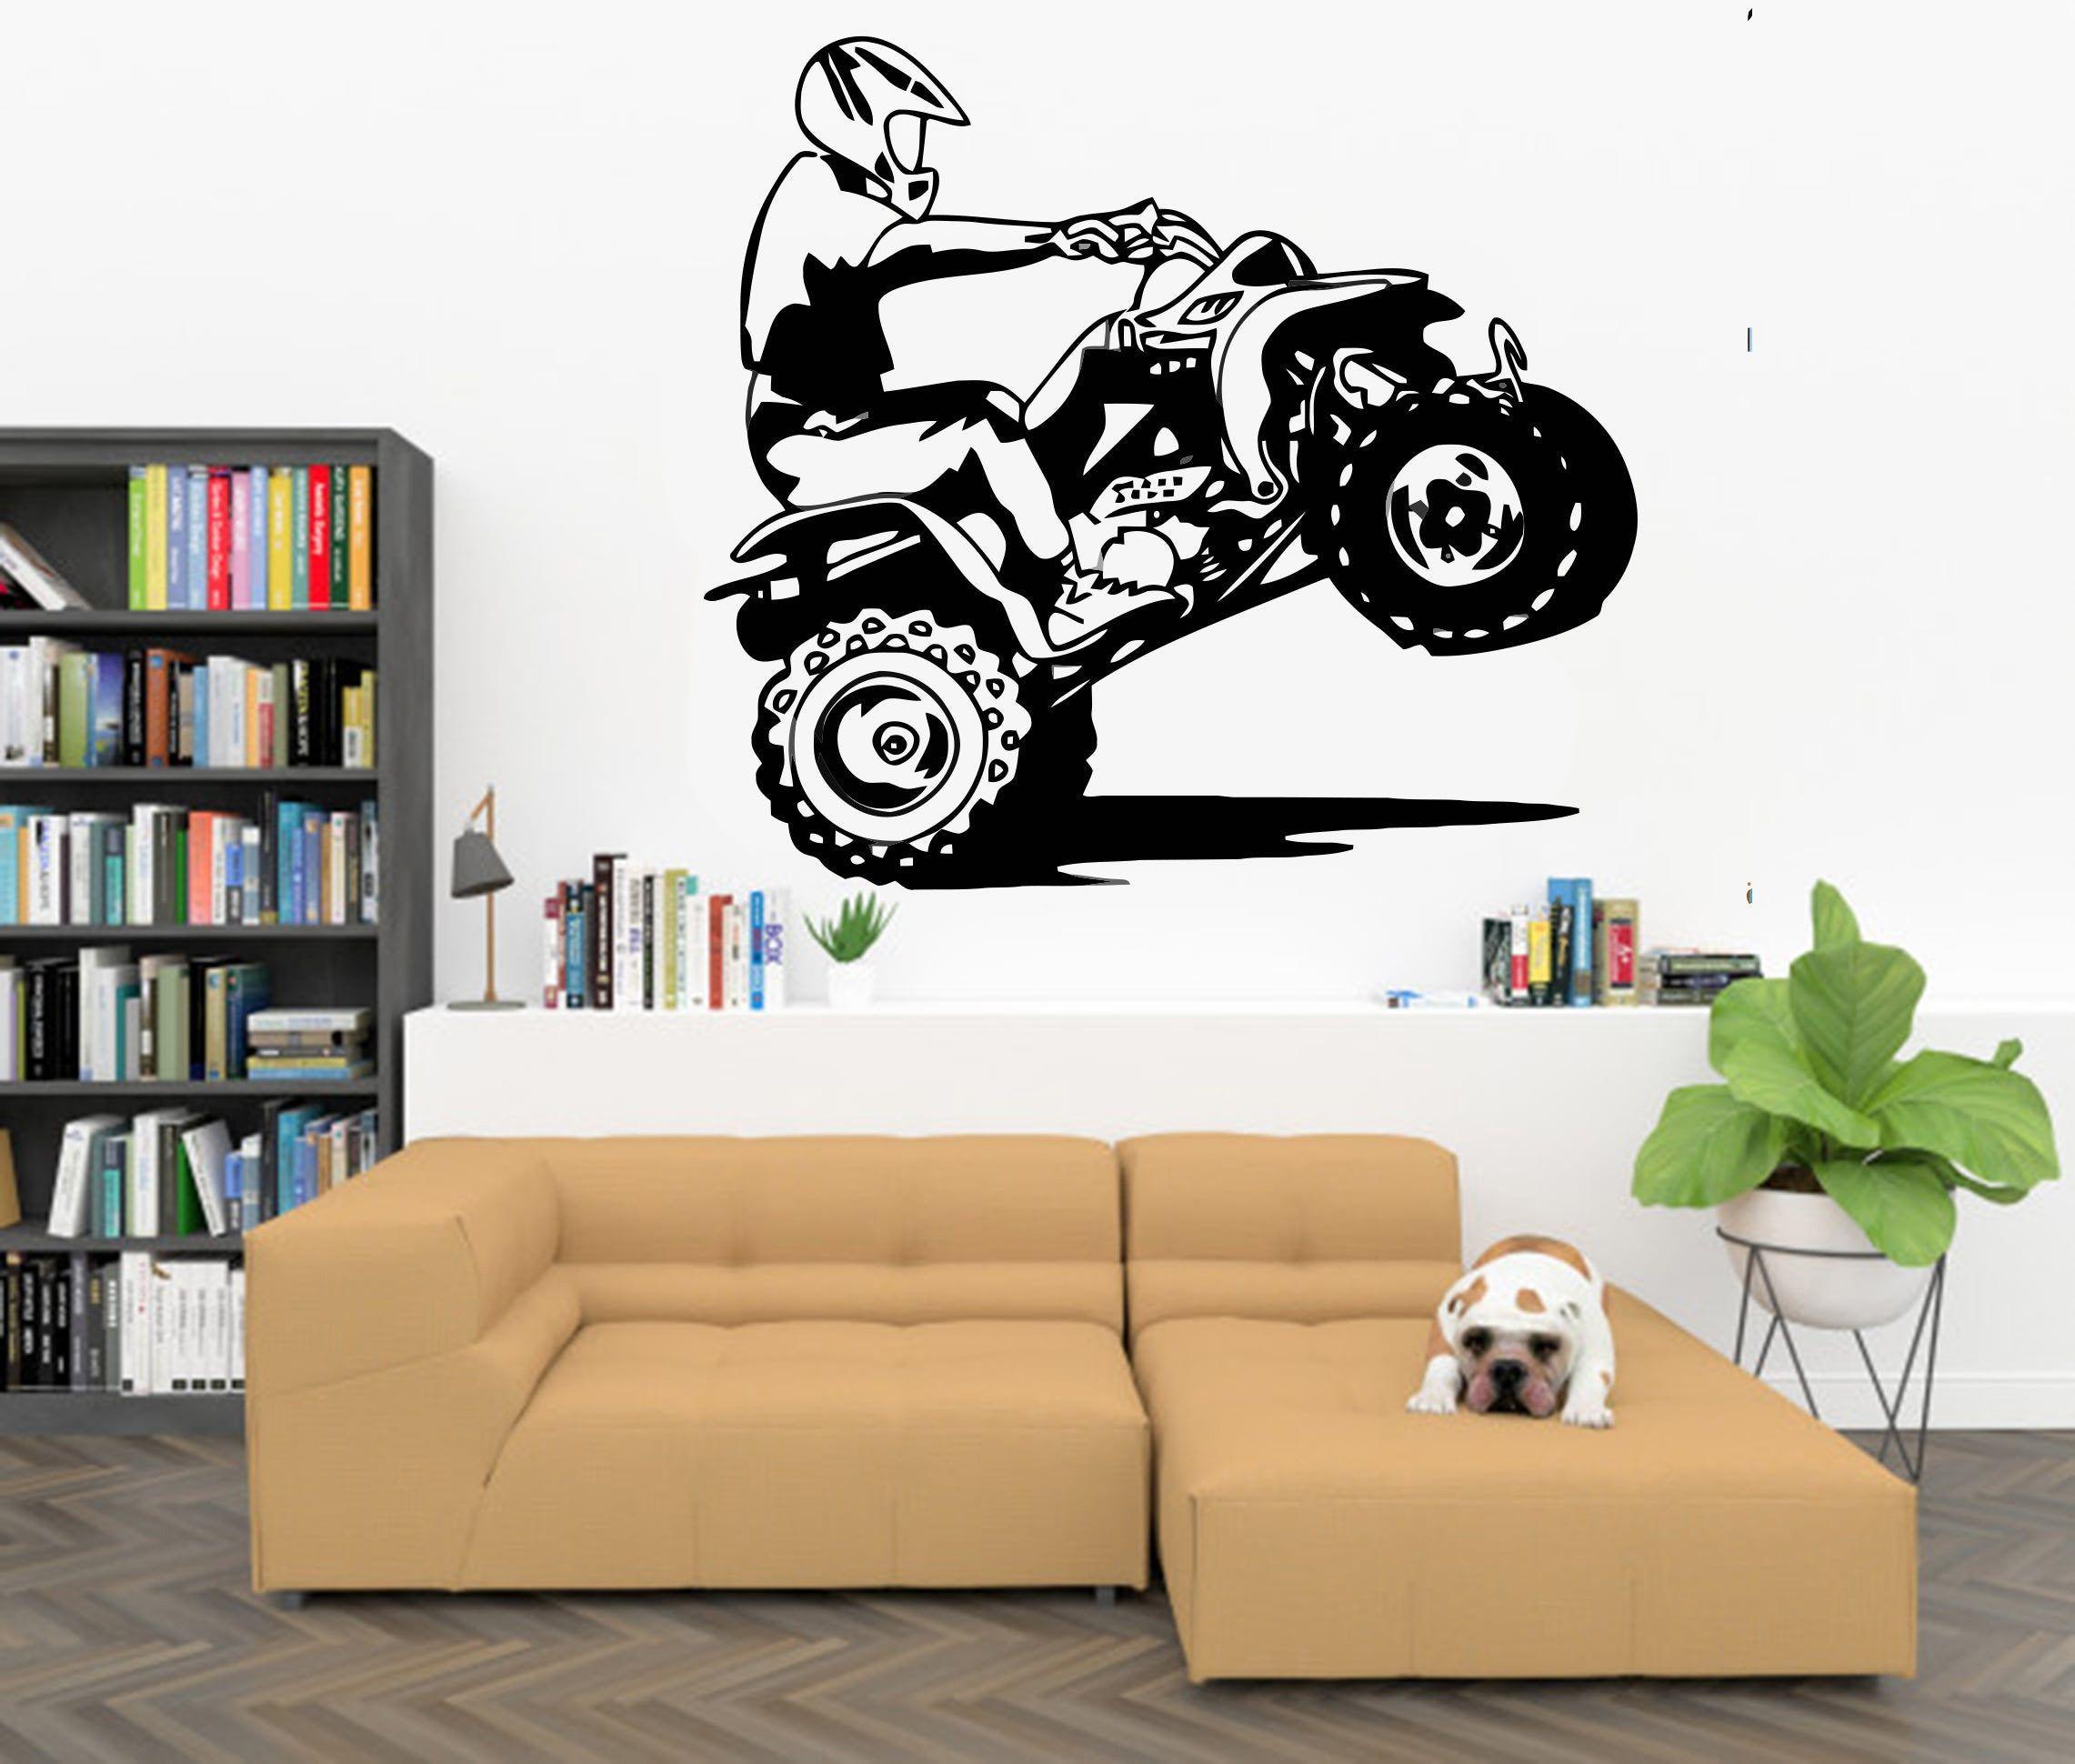 Motorcross wall decor Free Style Bedroom Stickers Art